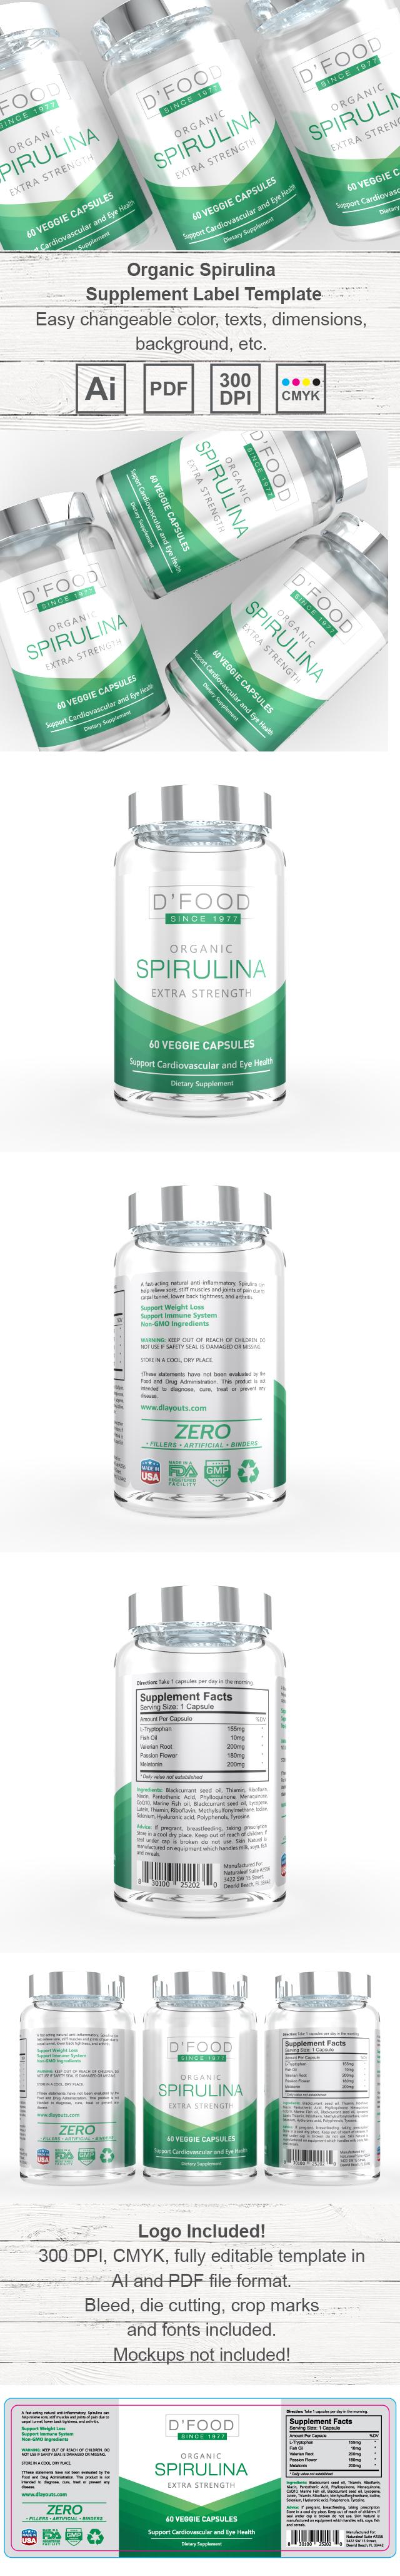 Spirulina Supplement Label Template